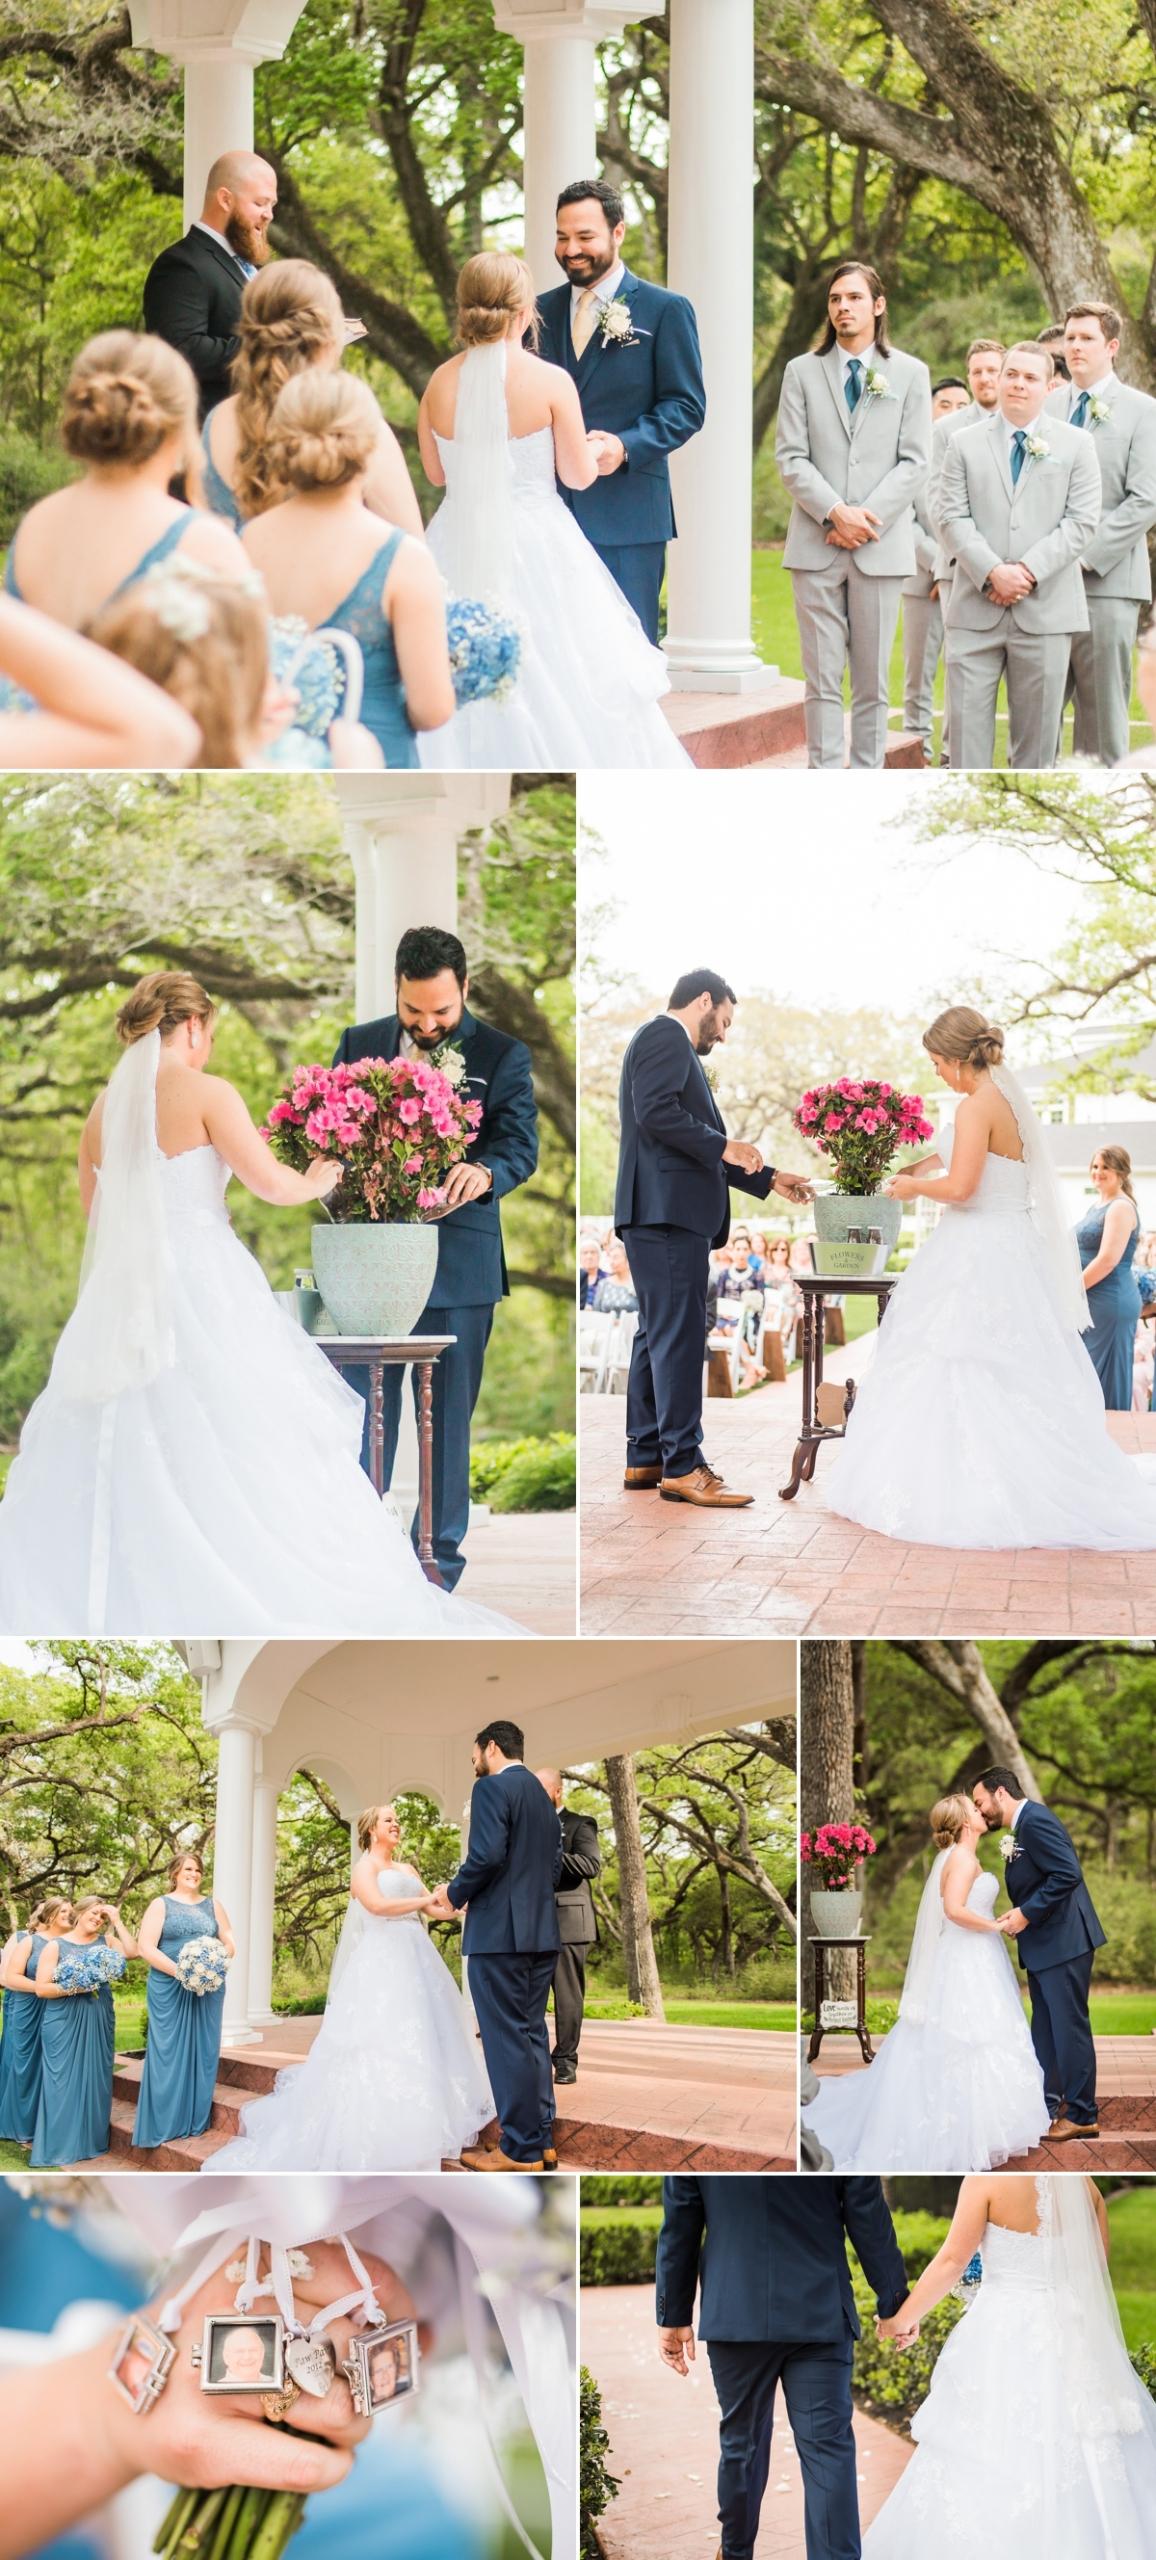 Magnolia manor wedding ceremony